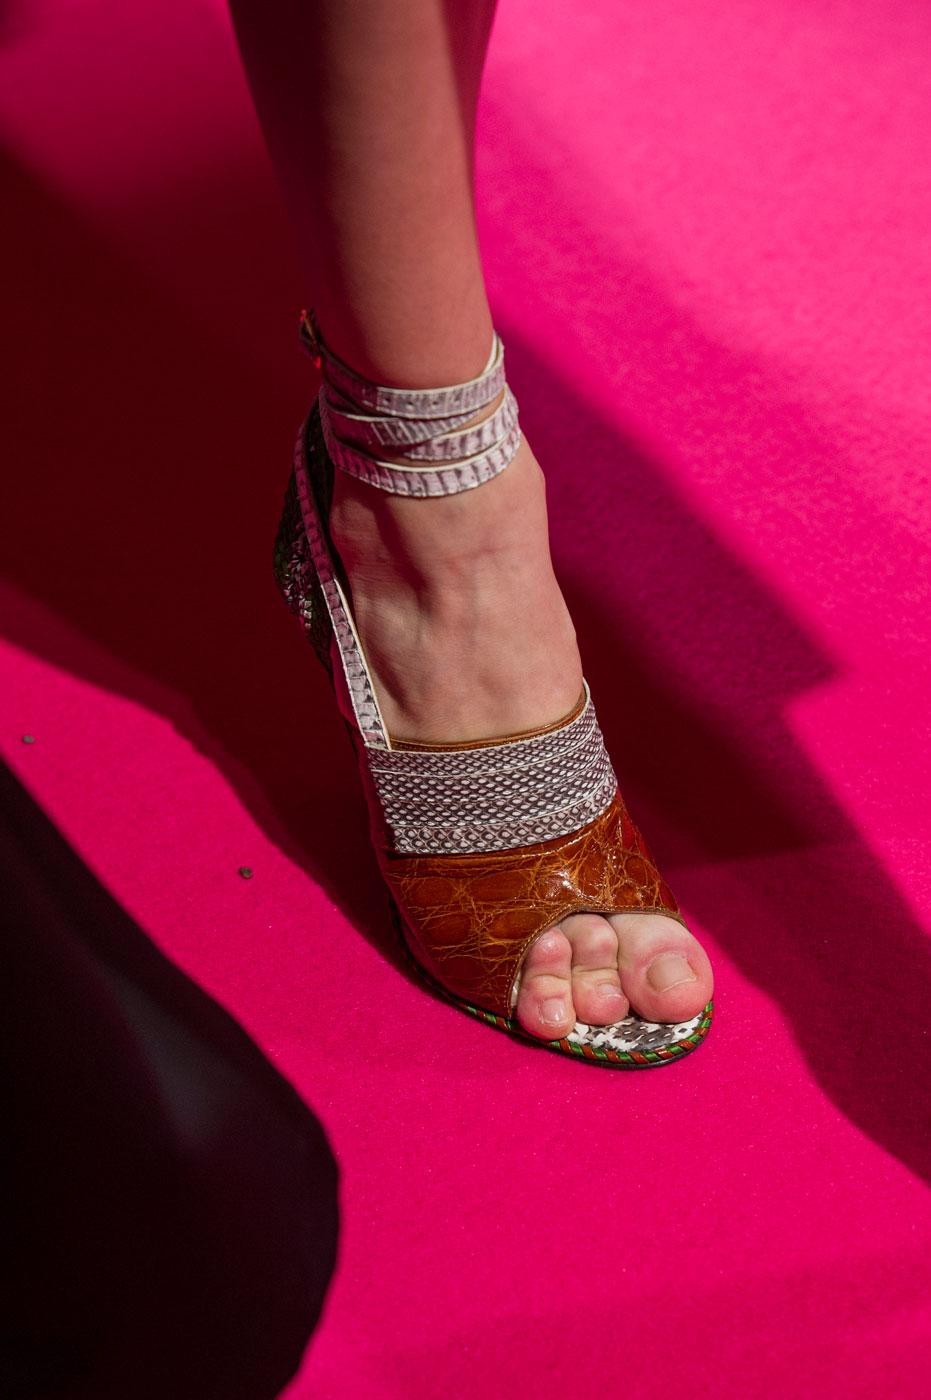 Schiaparelli-fashion-runway-show-close-ups-haute-couture-paris-spring-summer-2015-the-impression-60